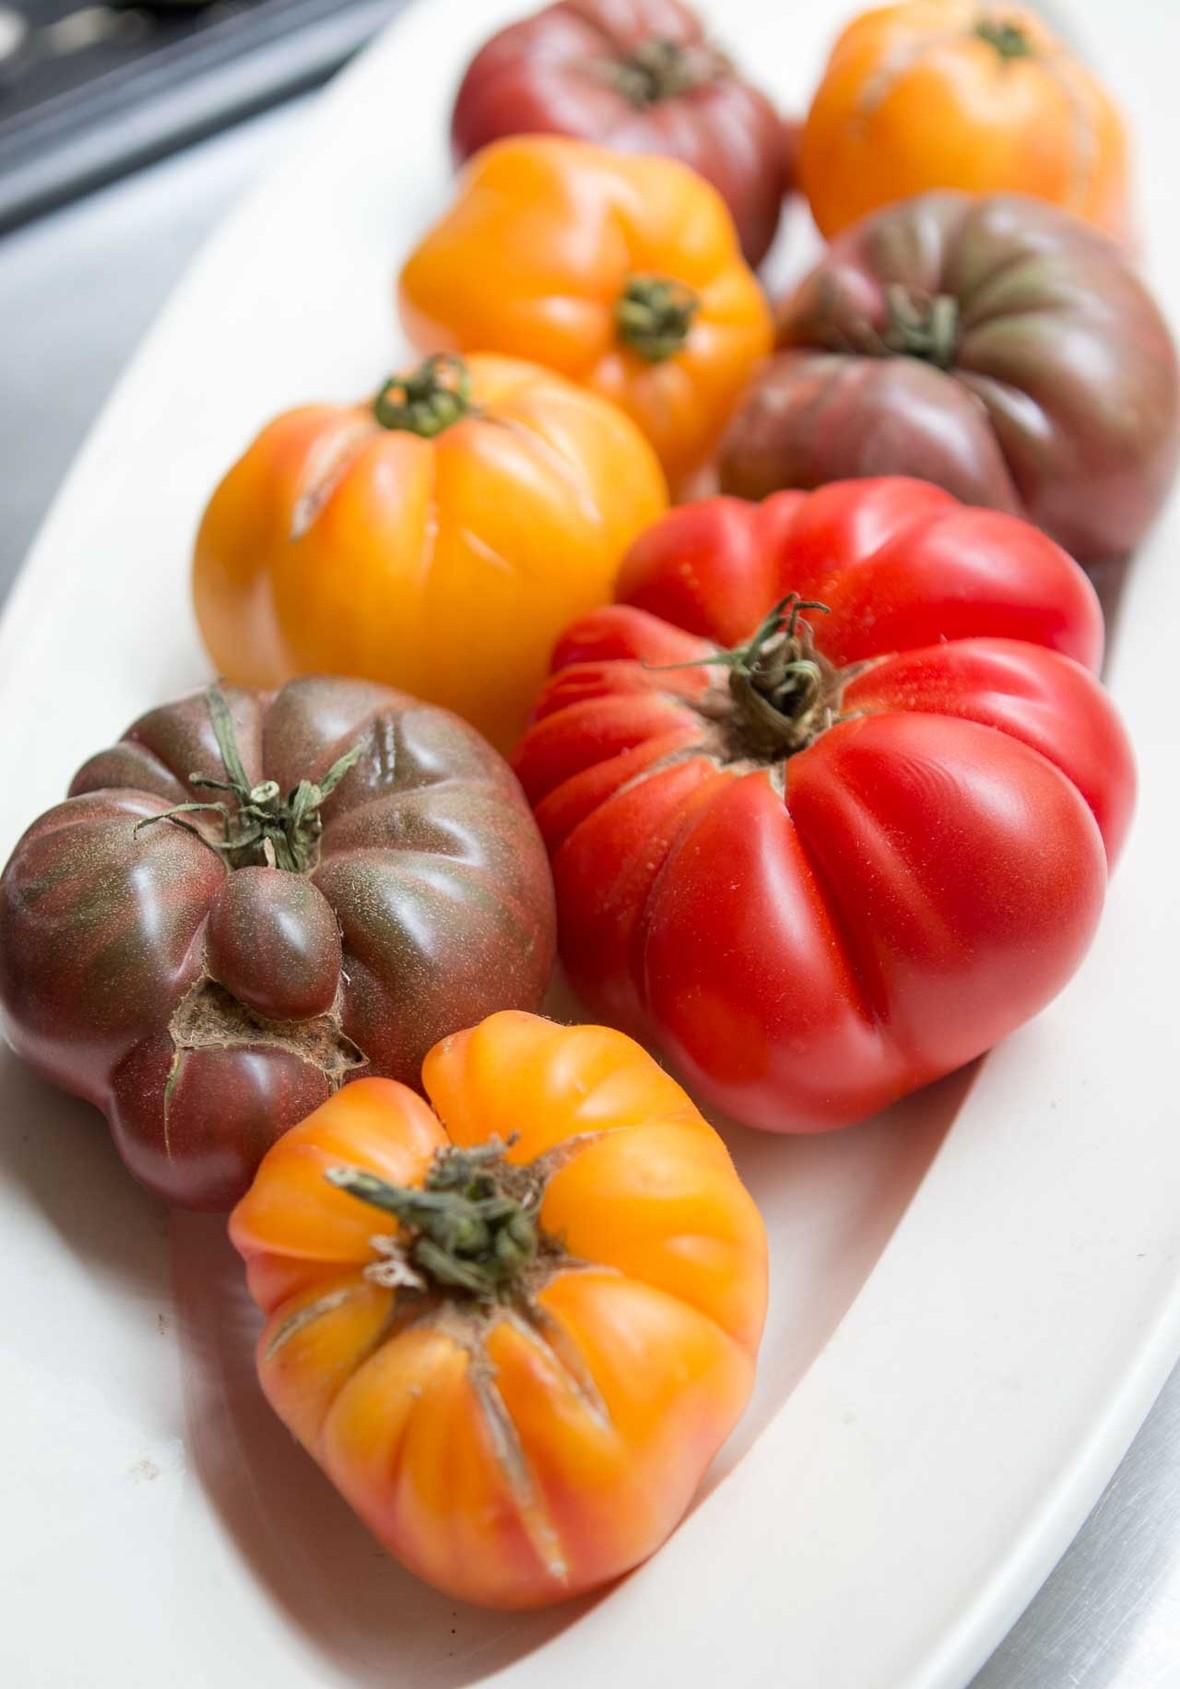 Tomato basil shelling bean salad recipe-2